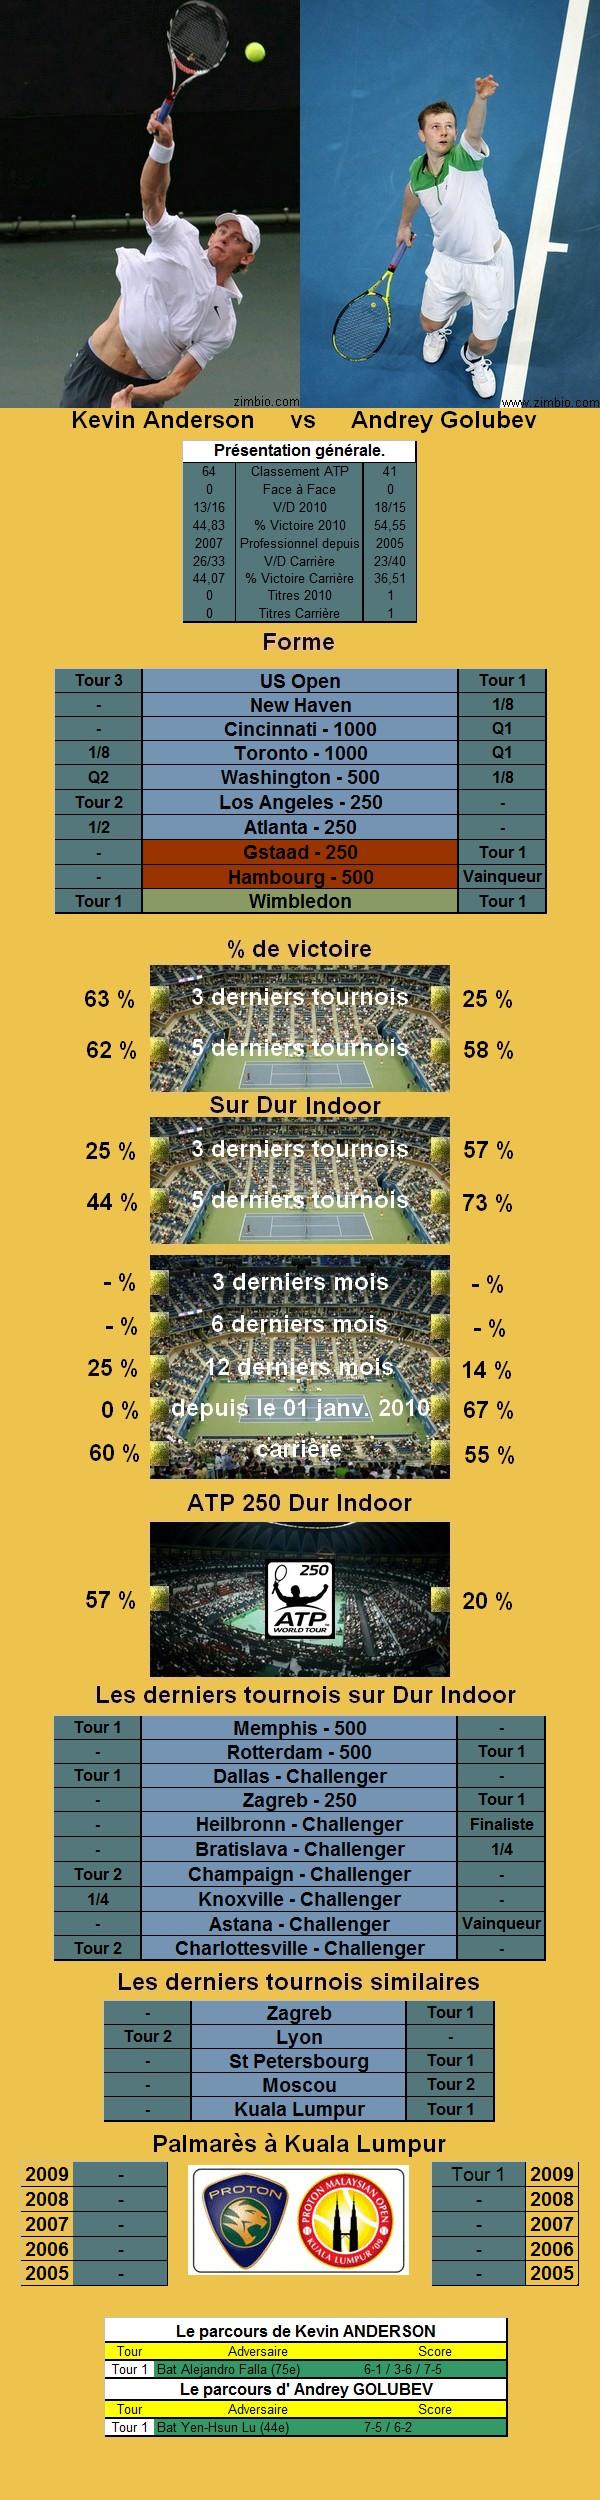 Statistiques tennis de Anderson contre Golubev à Kuala Lumpur